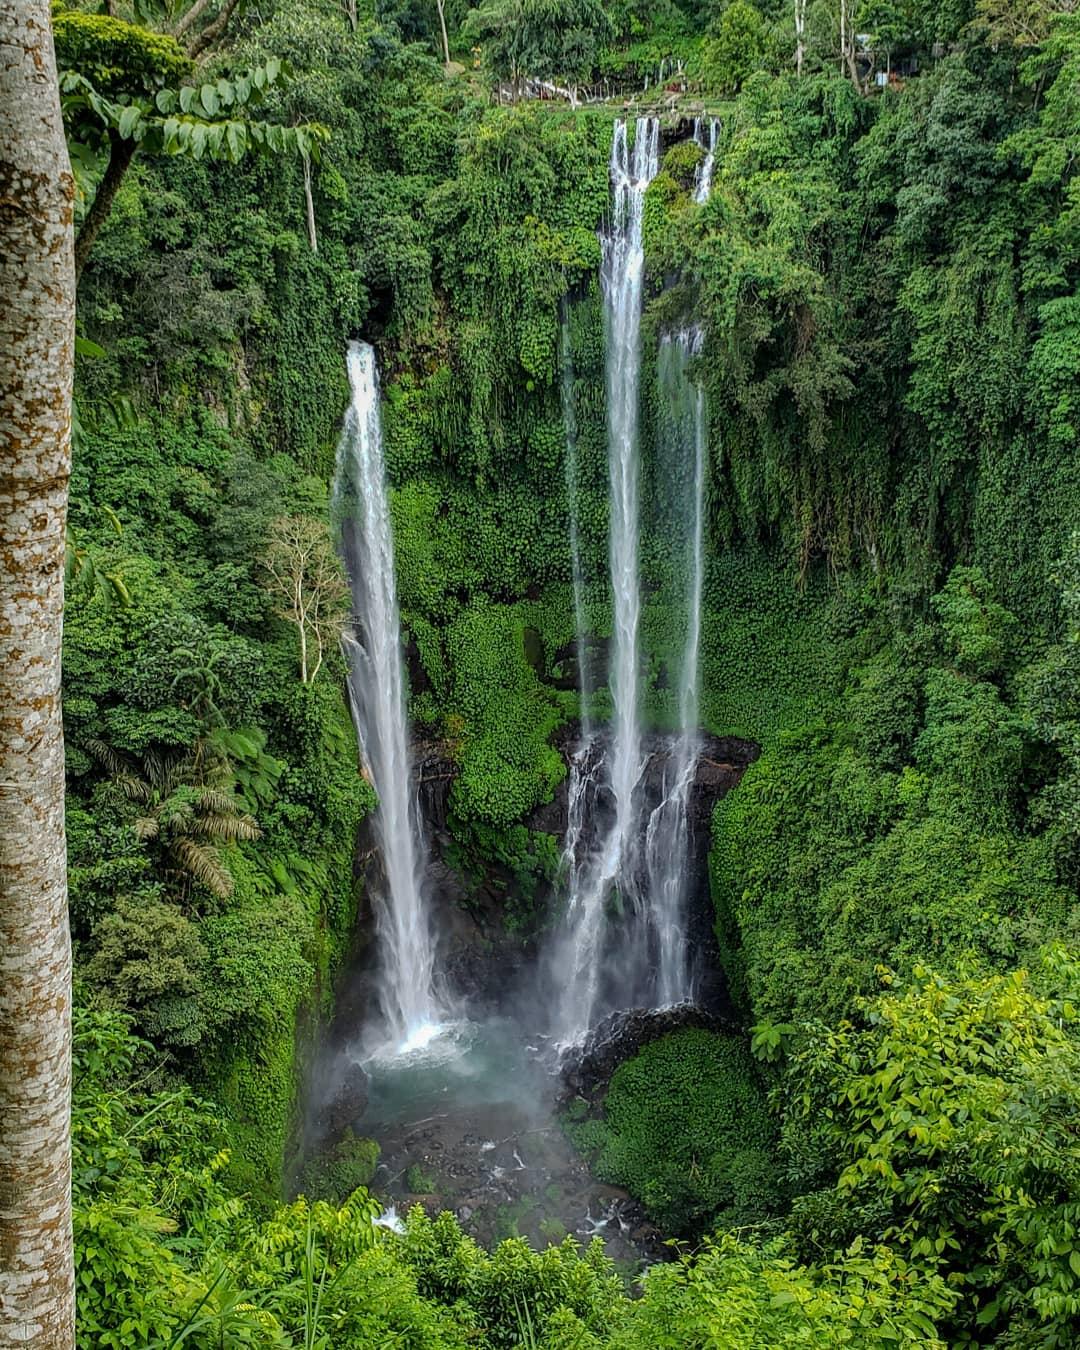 Waterfalls in Bali; Sekumpul Waterfall